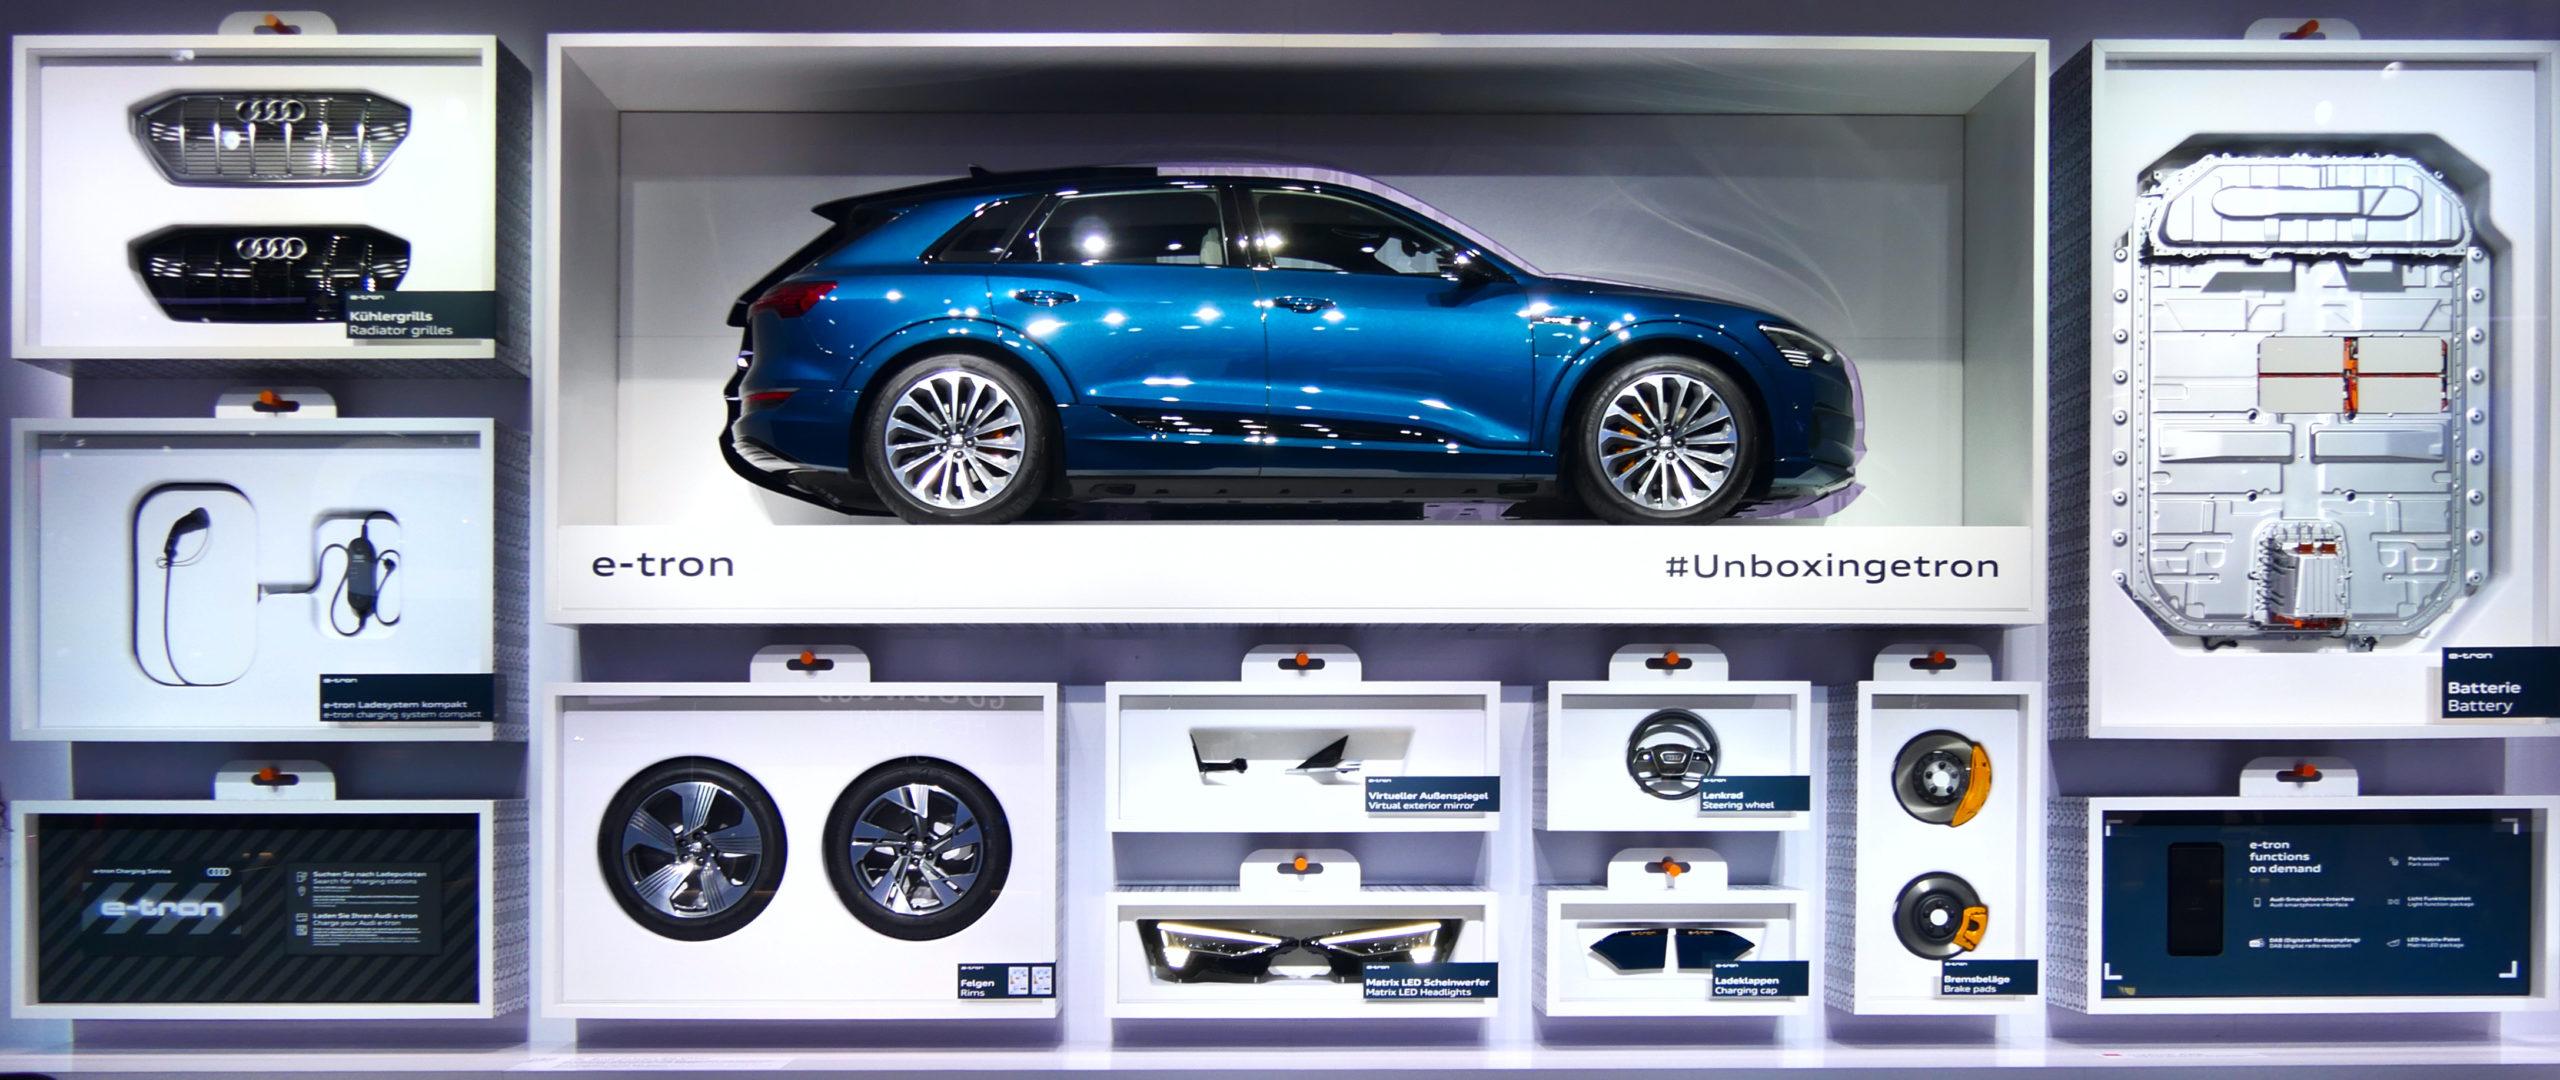 FRANKFURT, GERMANY - SEP 19, 2019: New Audi e-tron car showcased at the Frankfurt IAA Motor Show 2019. - Image